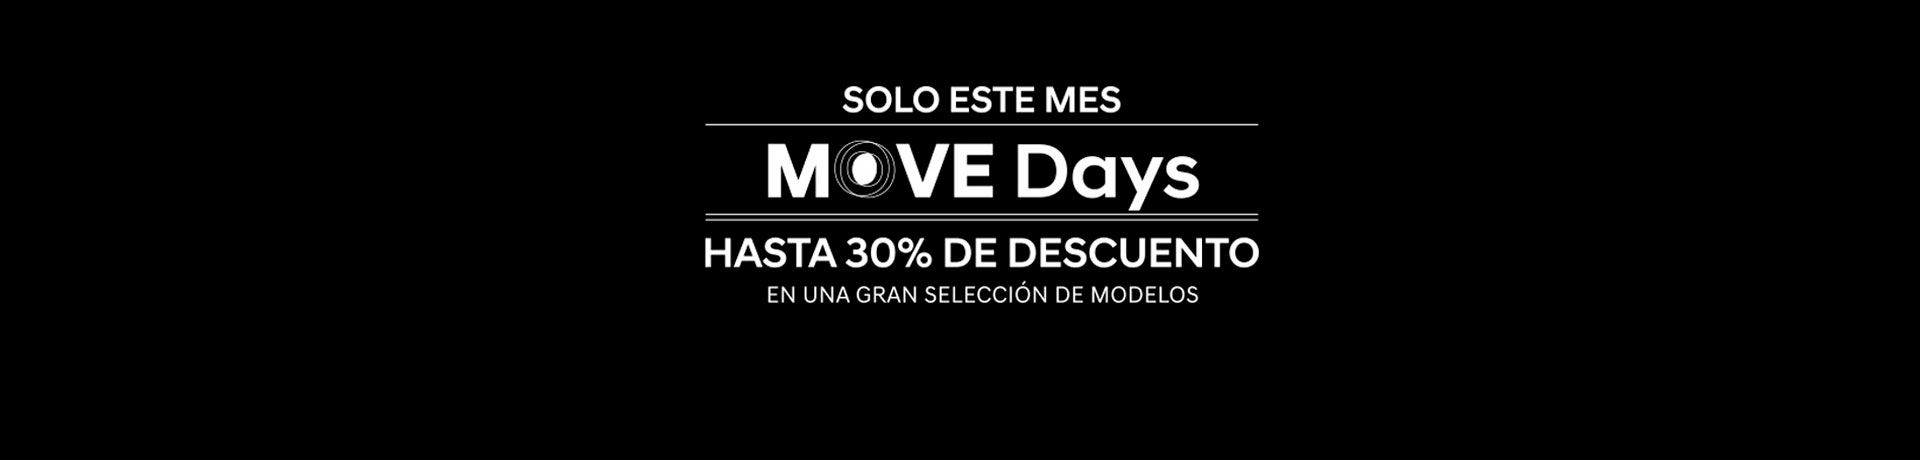 MOVE DAYS